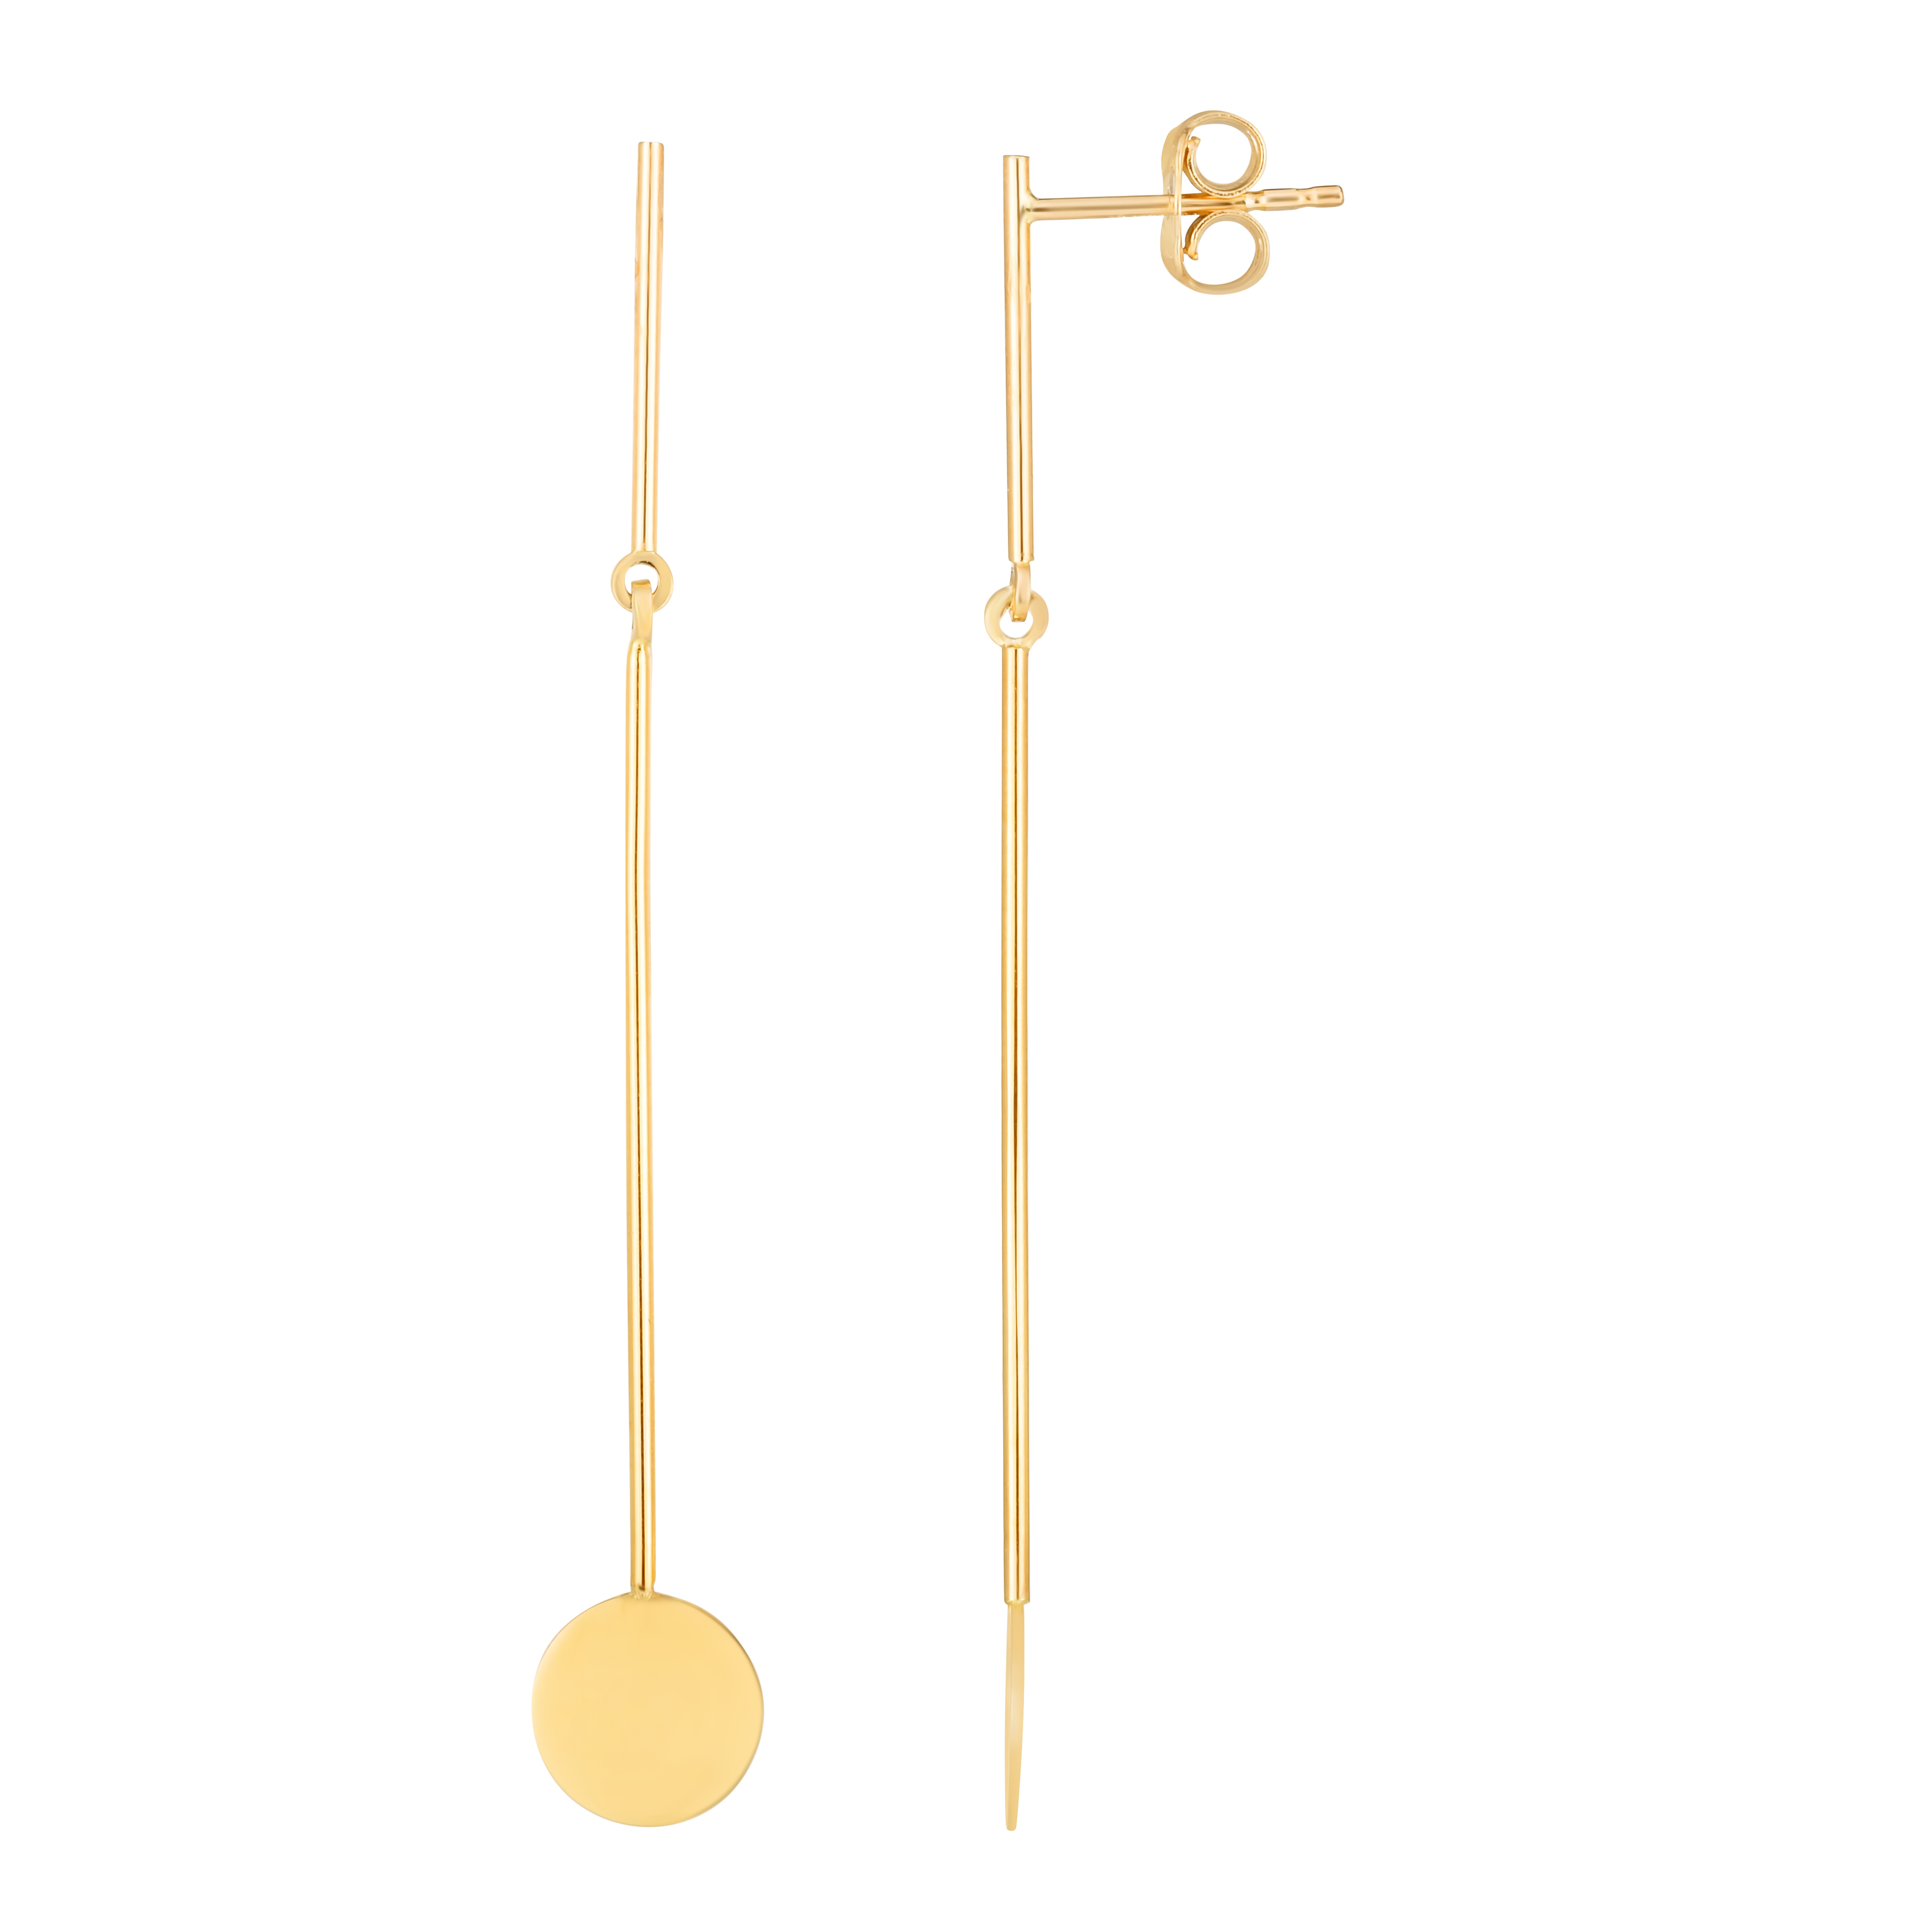 14k-gold-round-drop-earrings-er12018_ring